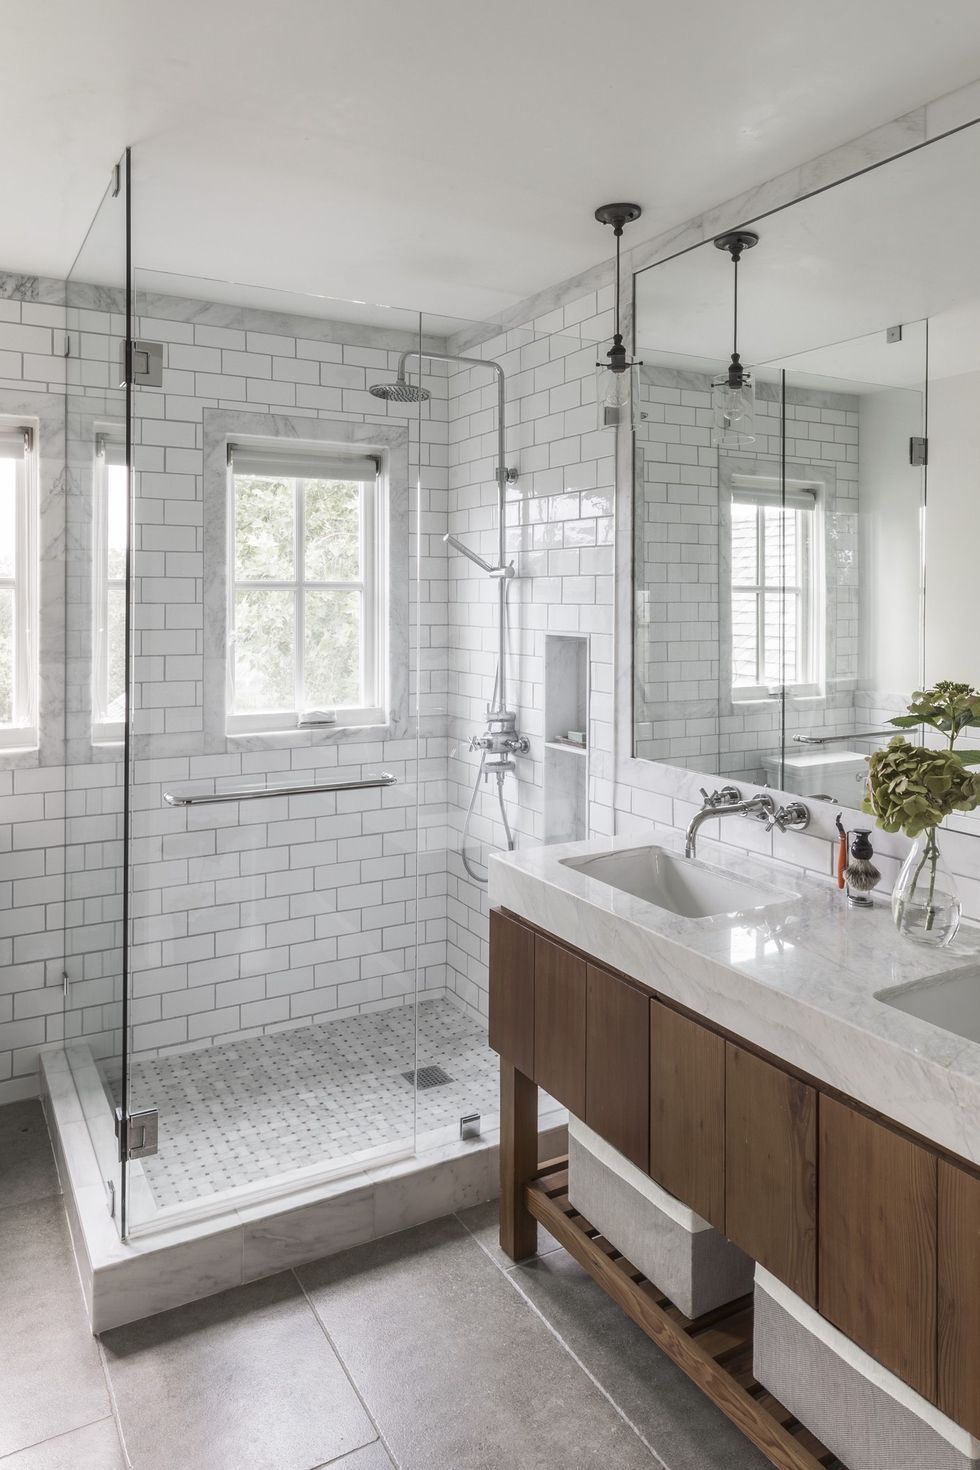 These Walk In Shower Ideas Will Help You Find Your Zen In 2020 Bathroom Shower Design Bathrooms Remodel Bathroom Renovations